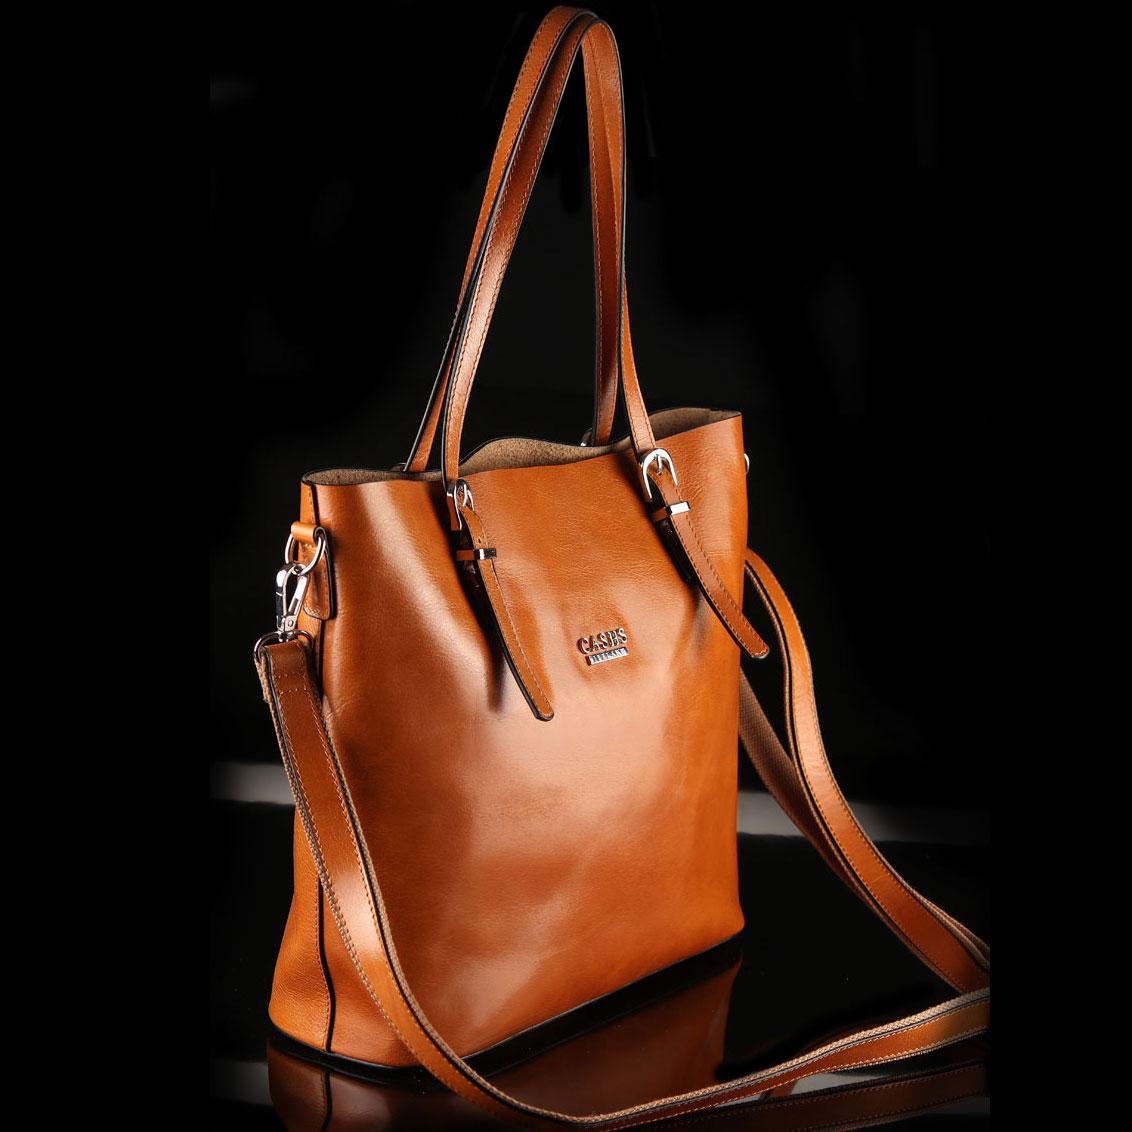 Cashs Ireland, Top Grain Leather Camel Adare Tote Handbag, Limited Edition